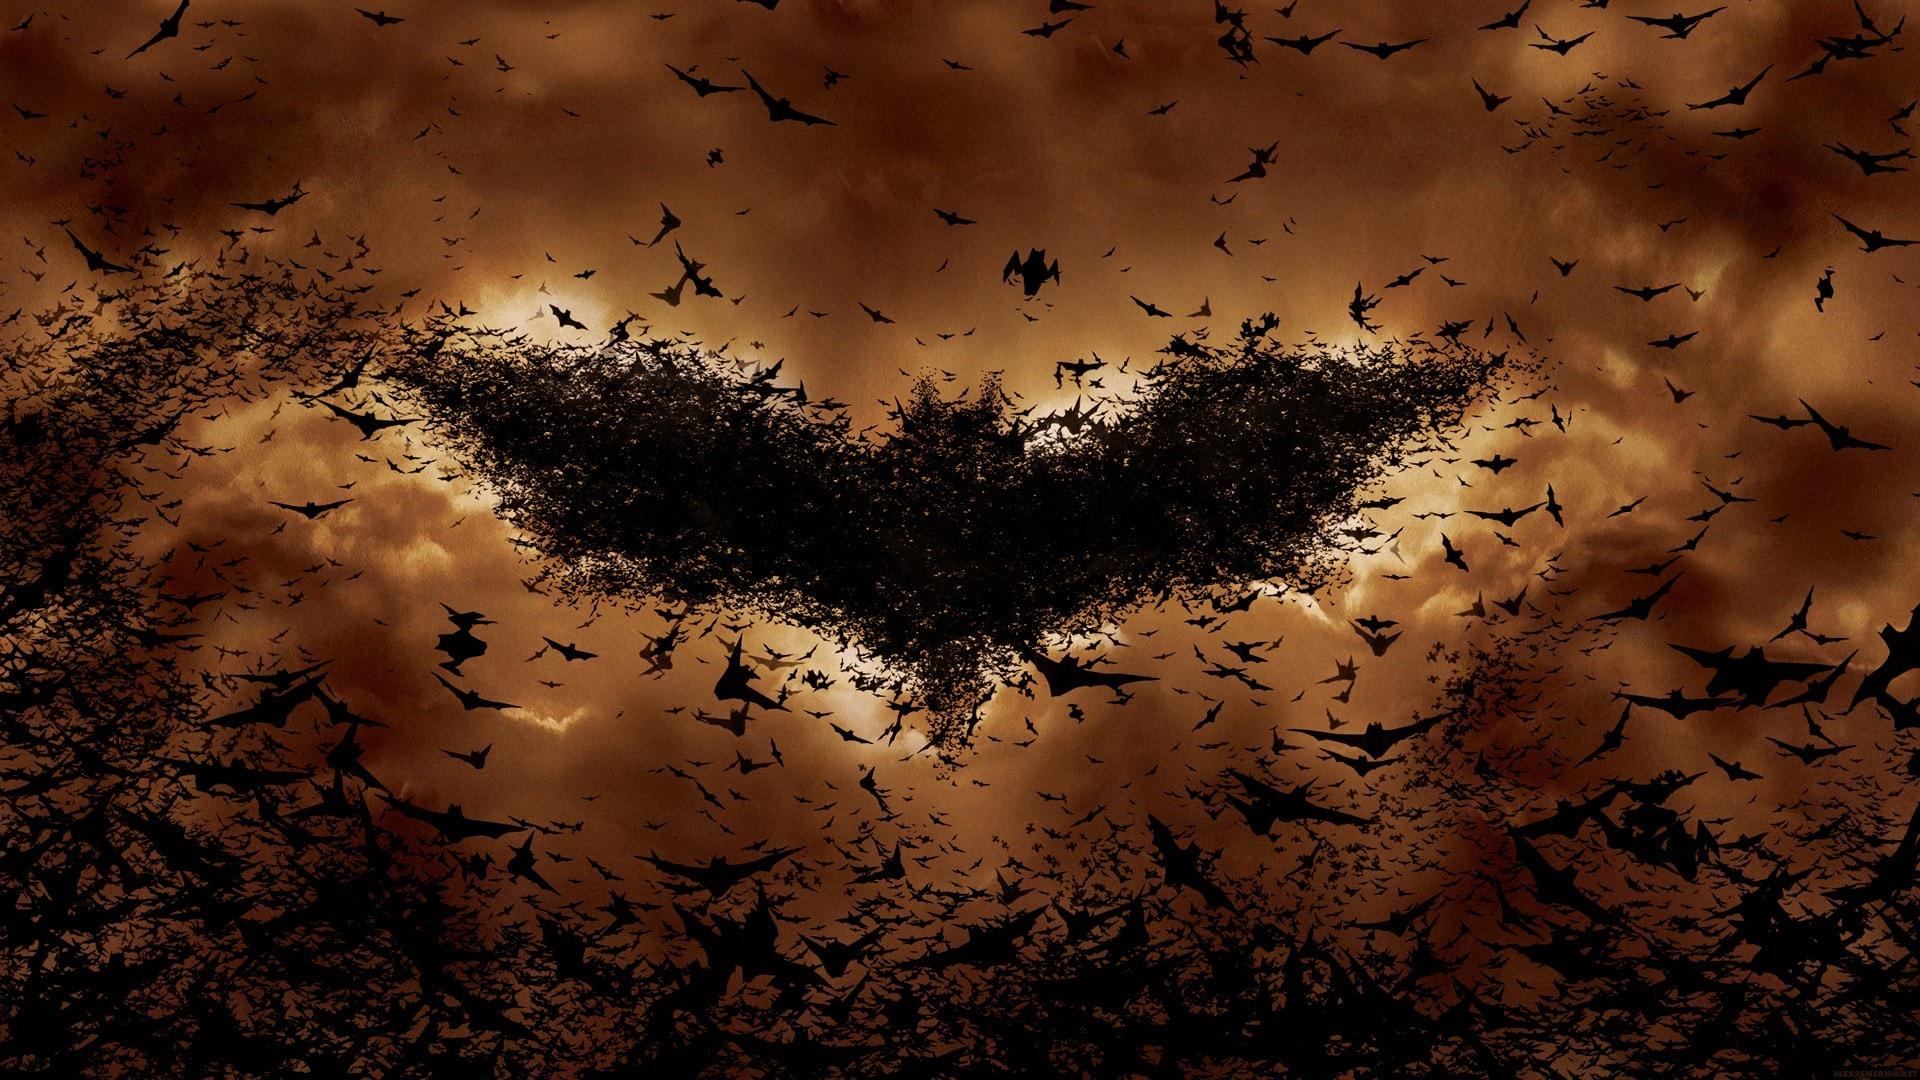 Bat Backgrounds